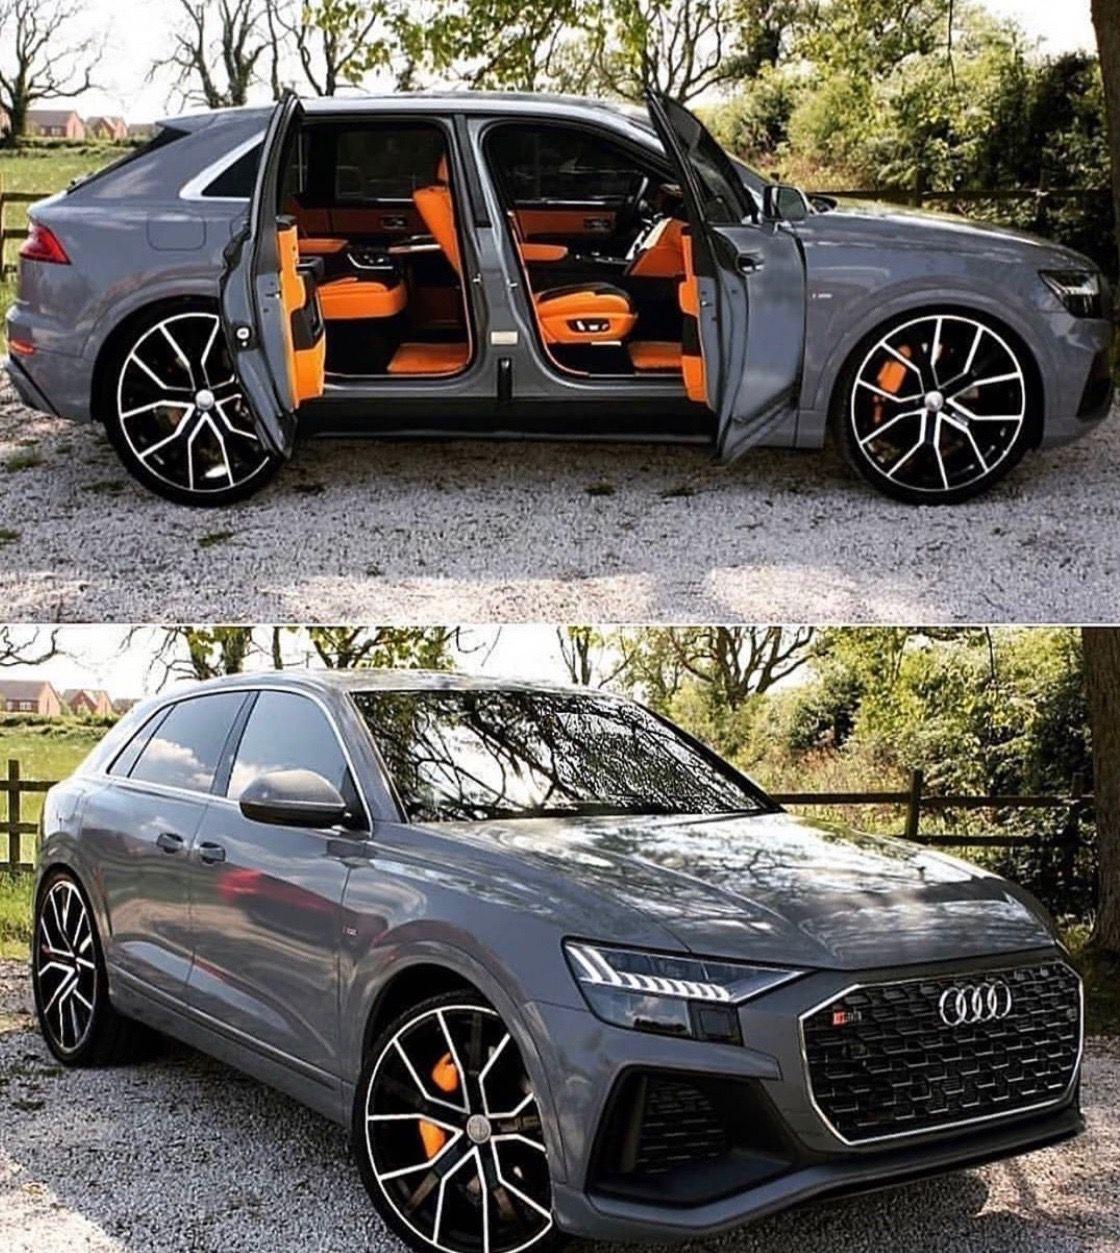 Audi Q8 Grey Orange Clean Different Super Cars Dream Cars Audi